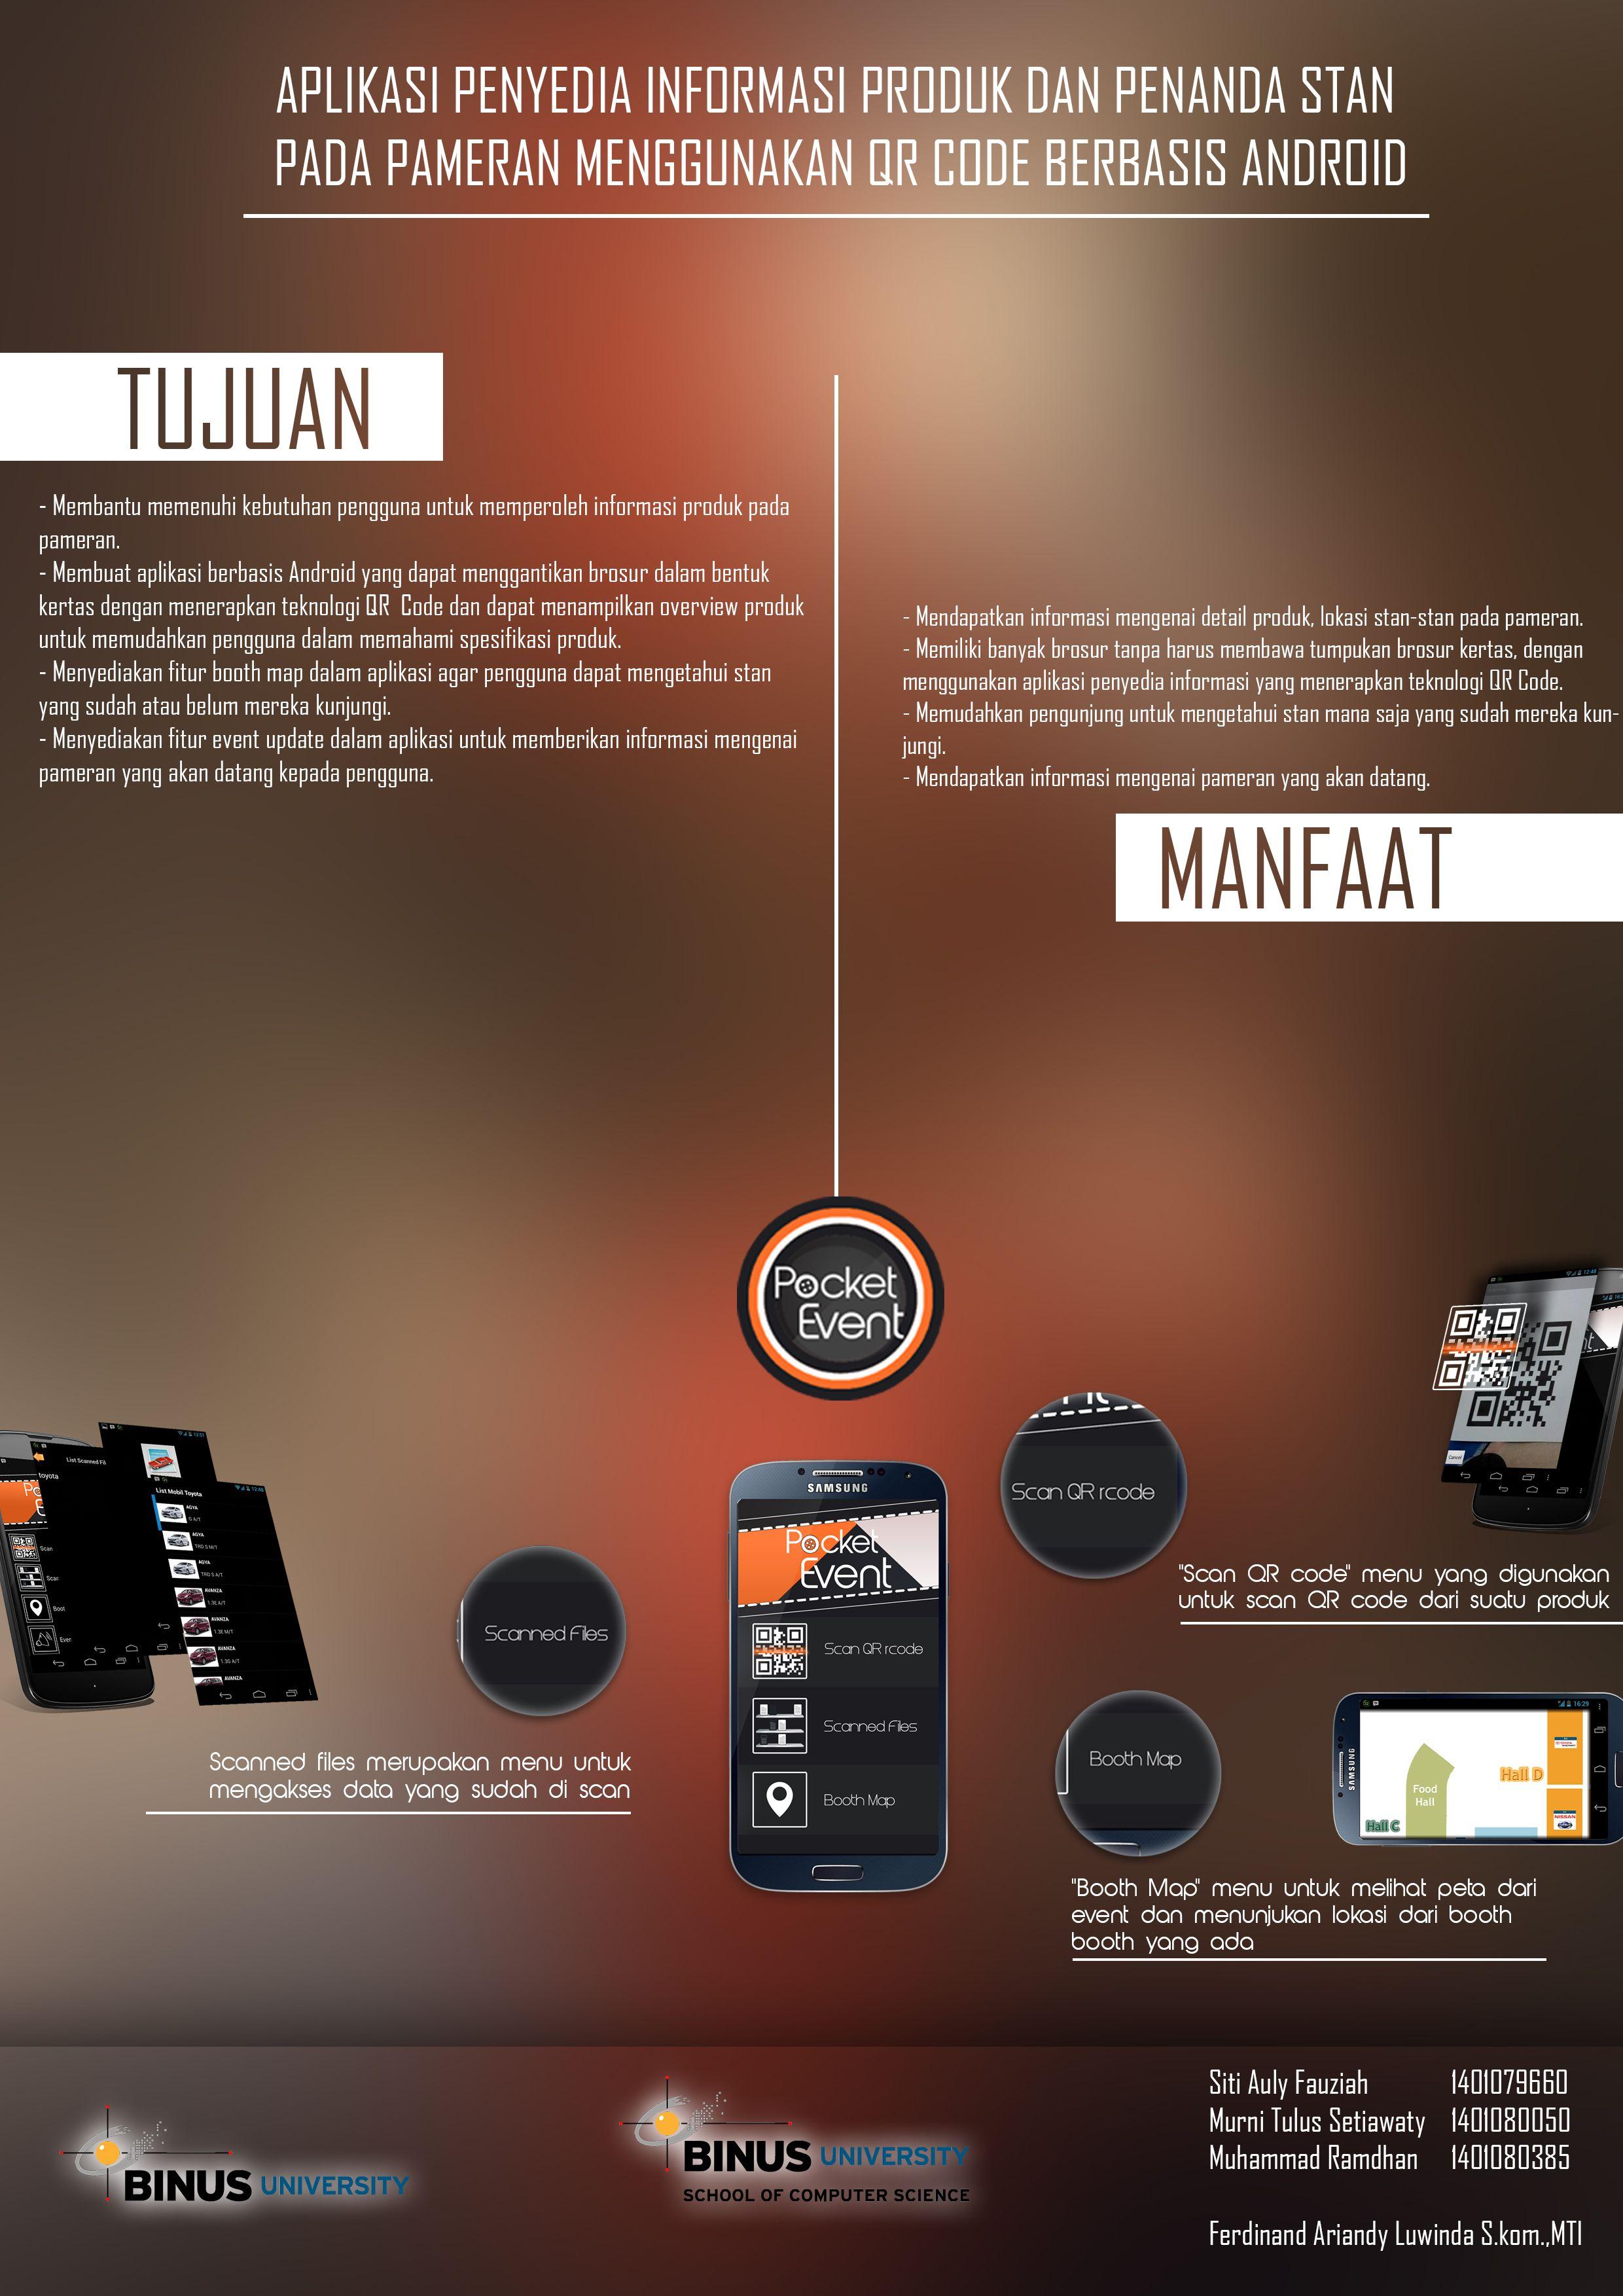 Product Info Graphic For My Research App Aplikasi Brosur Tanda